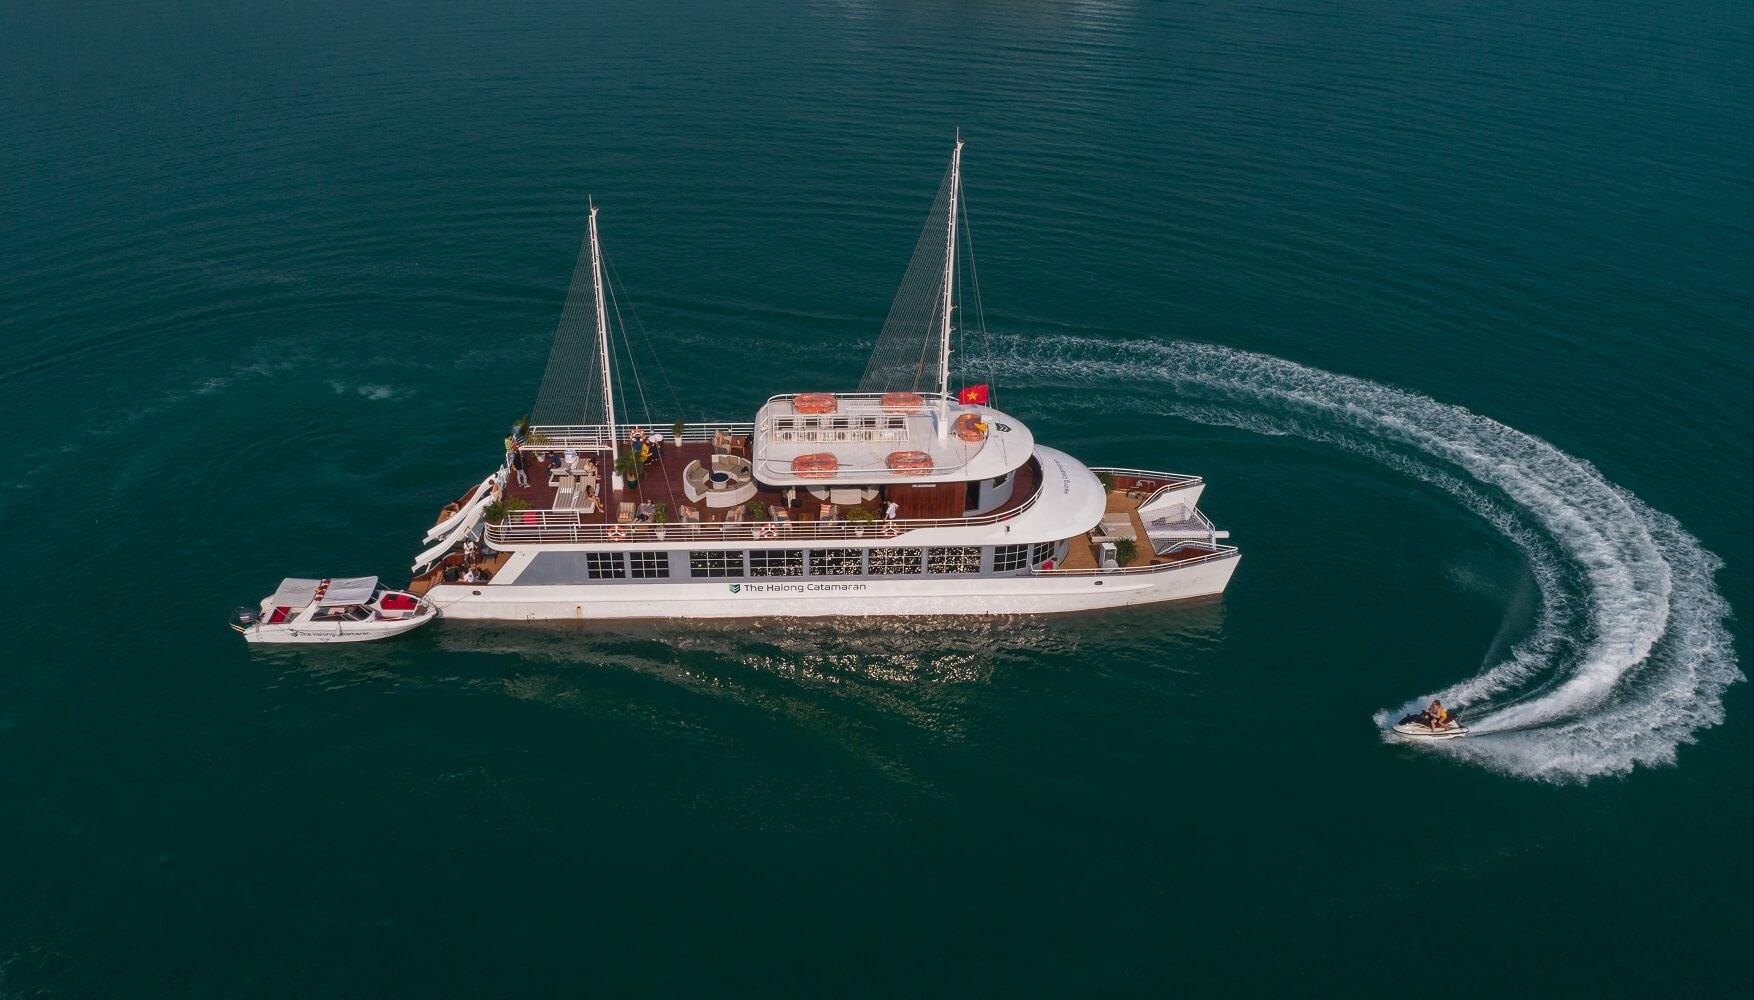 Overview - Catamaran Cruise